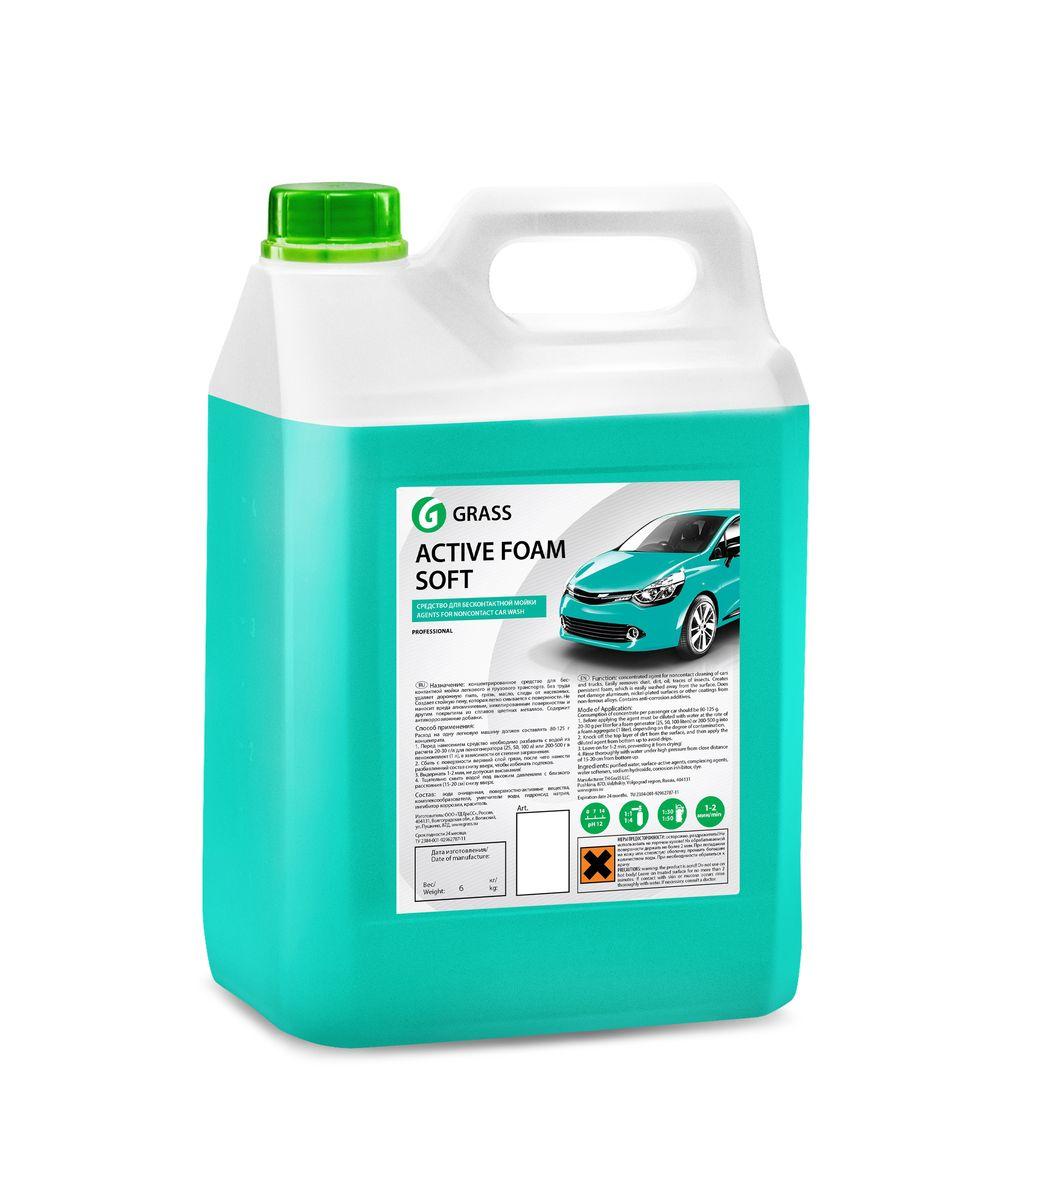 Активная пена Grass Active Foam Soft, 5,8 кг активная пена грасс купить